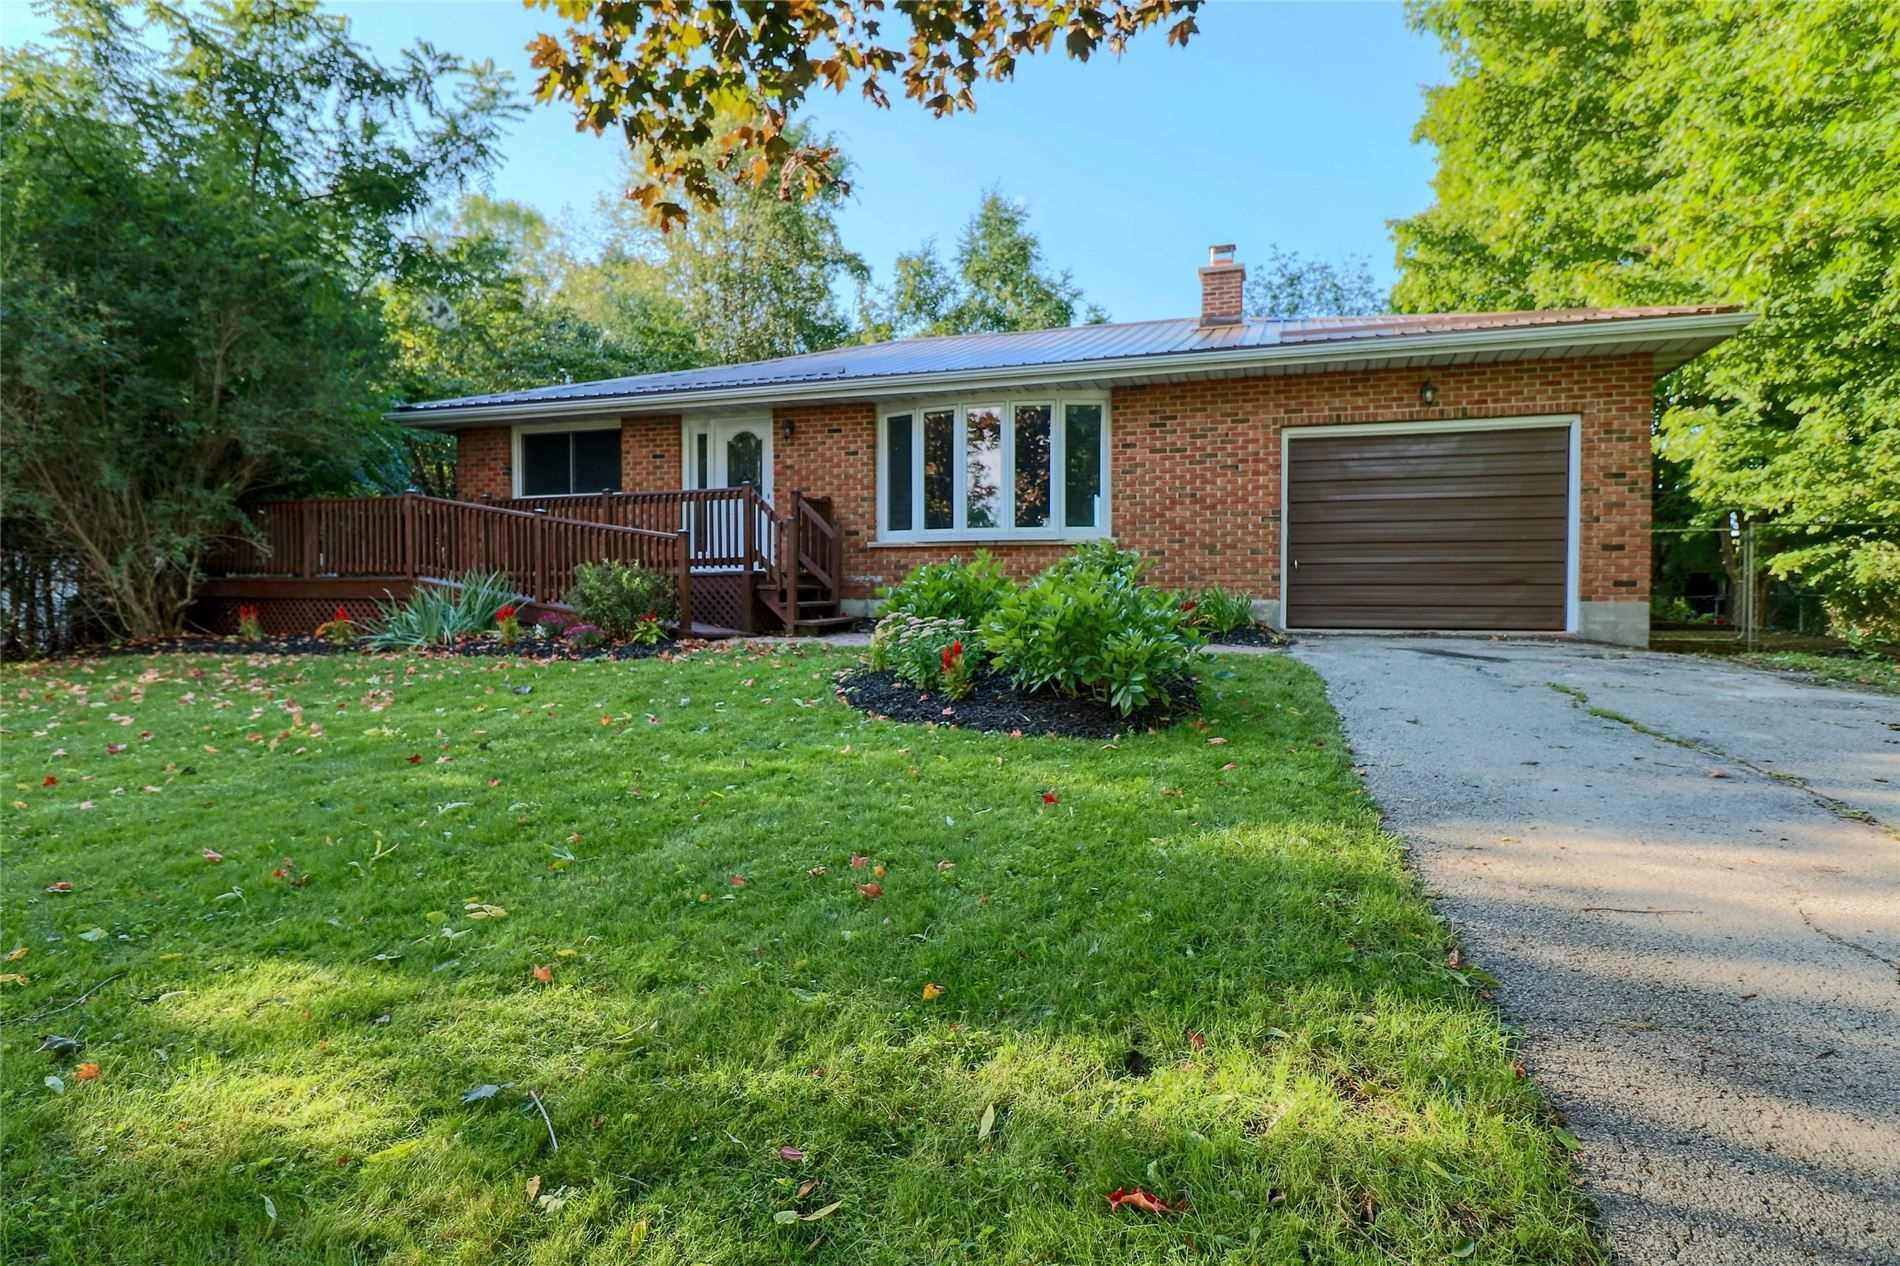 1275 Concession 9 Rd, Brock, Ontario (ID N4902727)